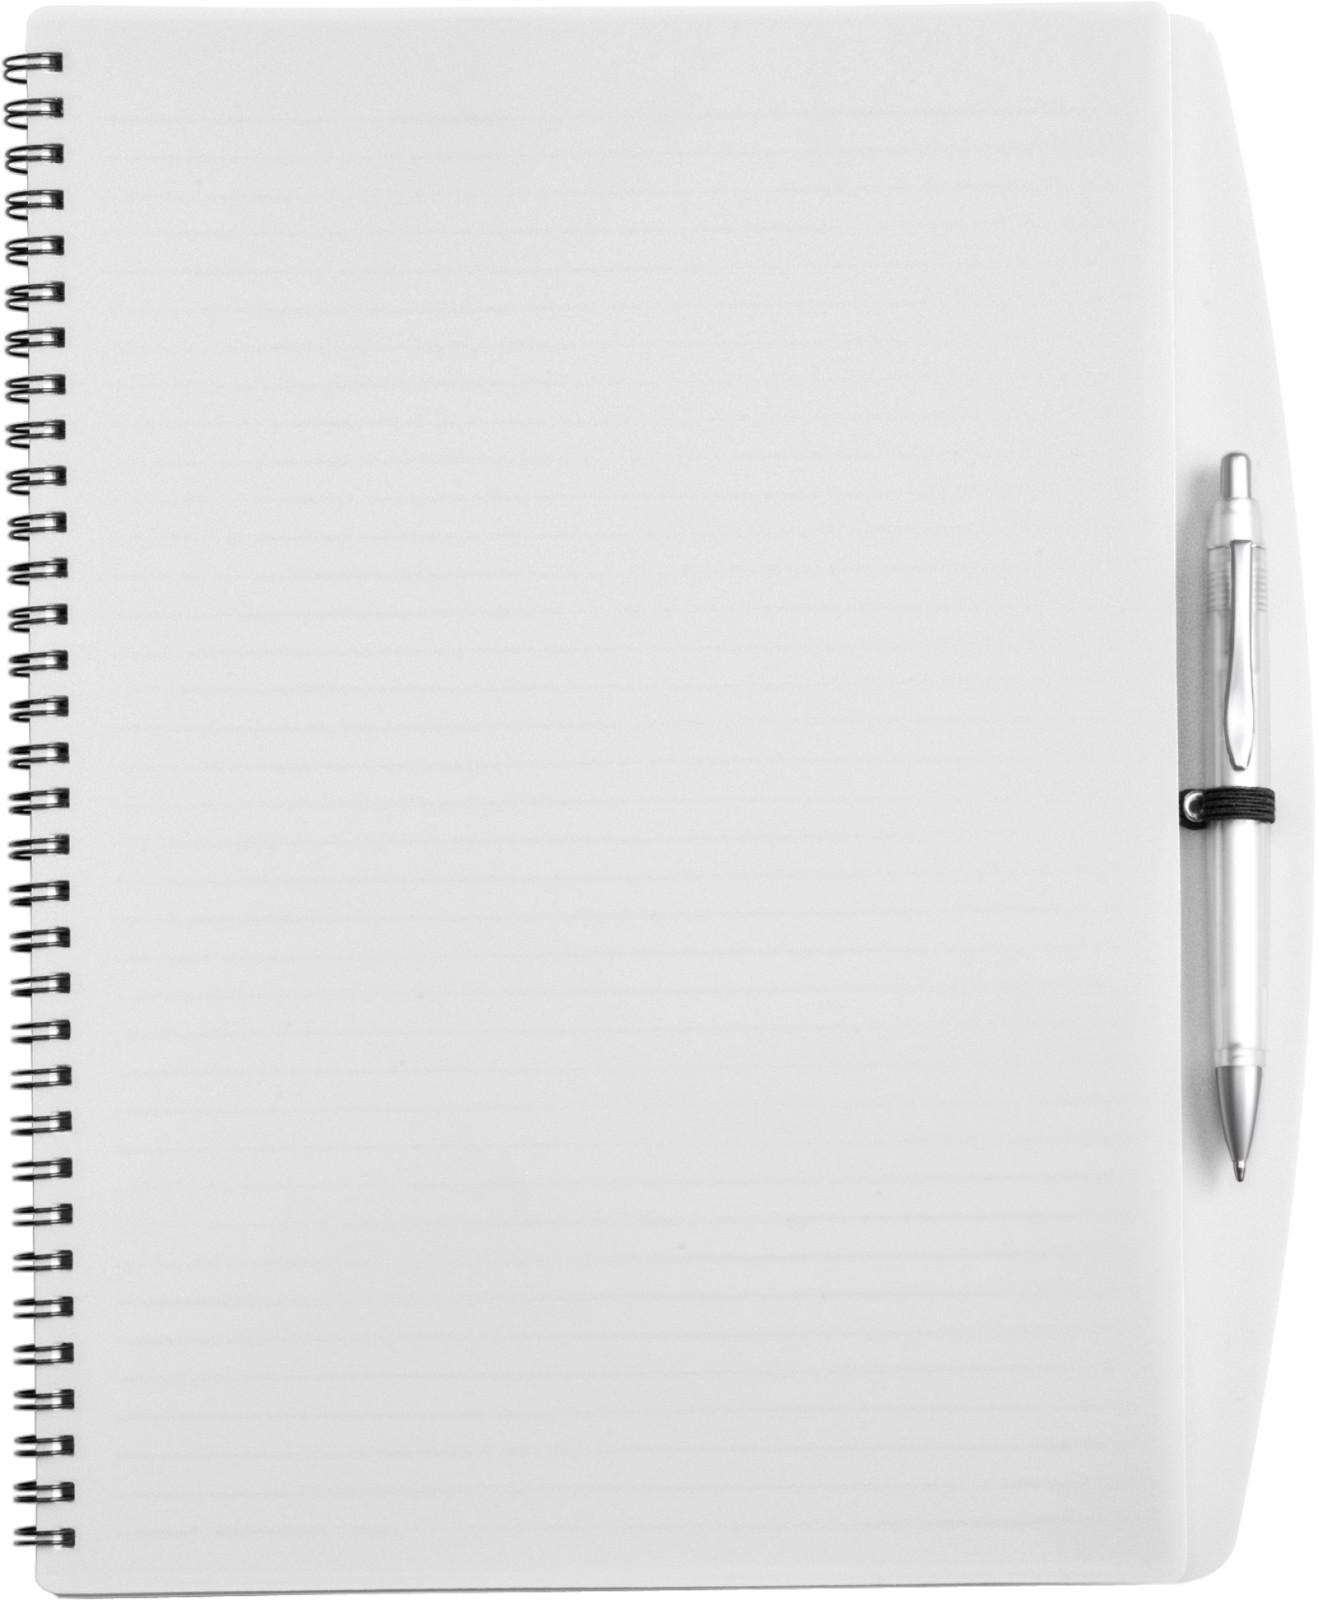 PP notebook with ballpen - White